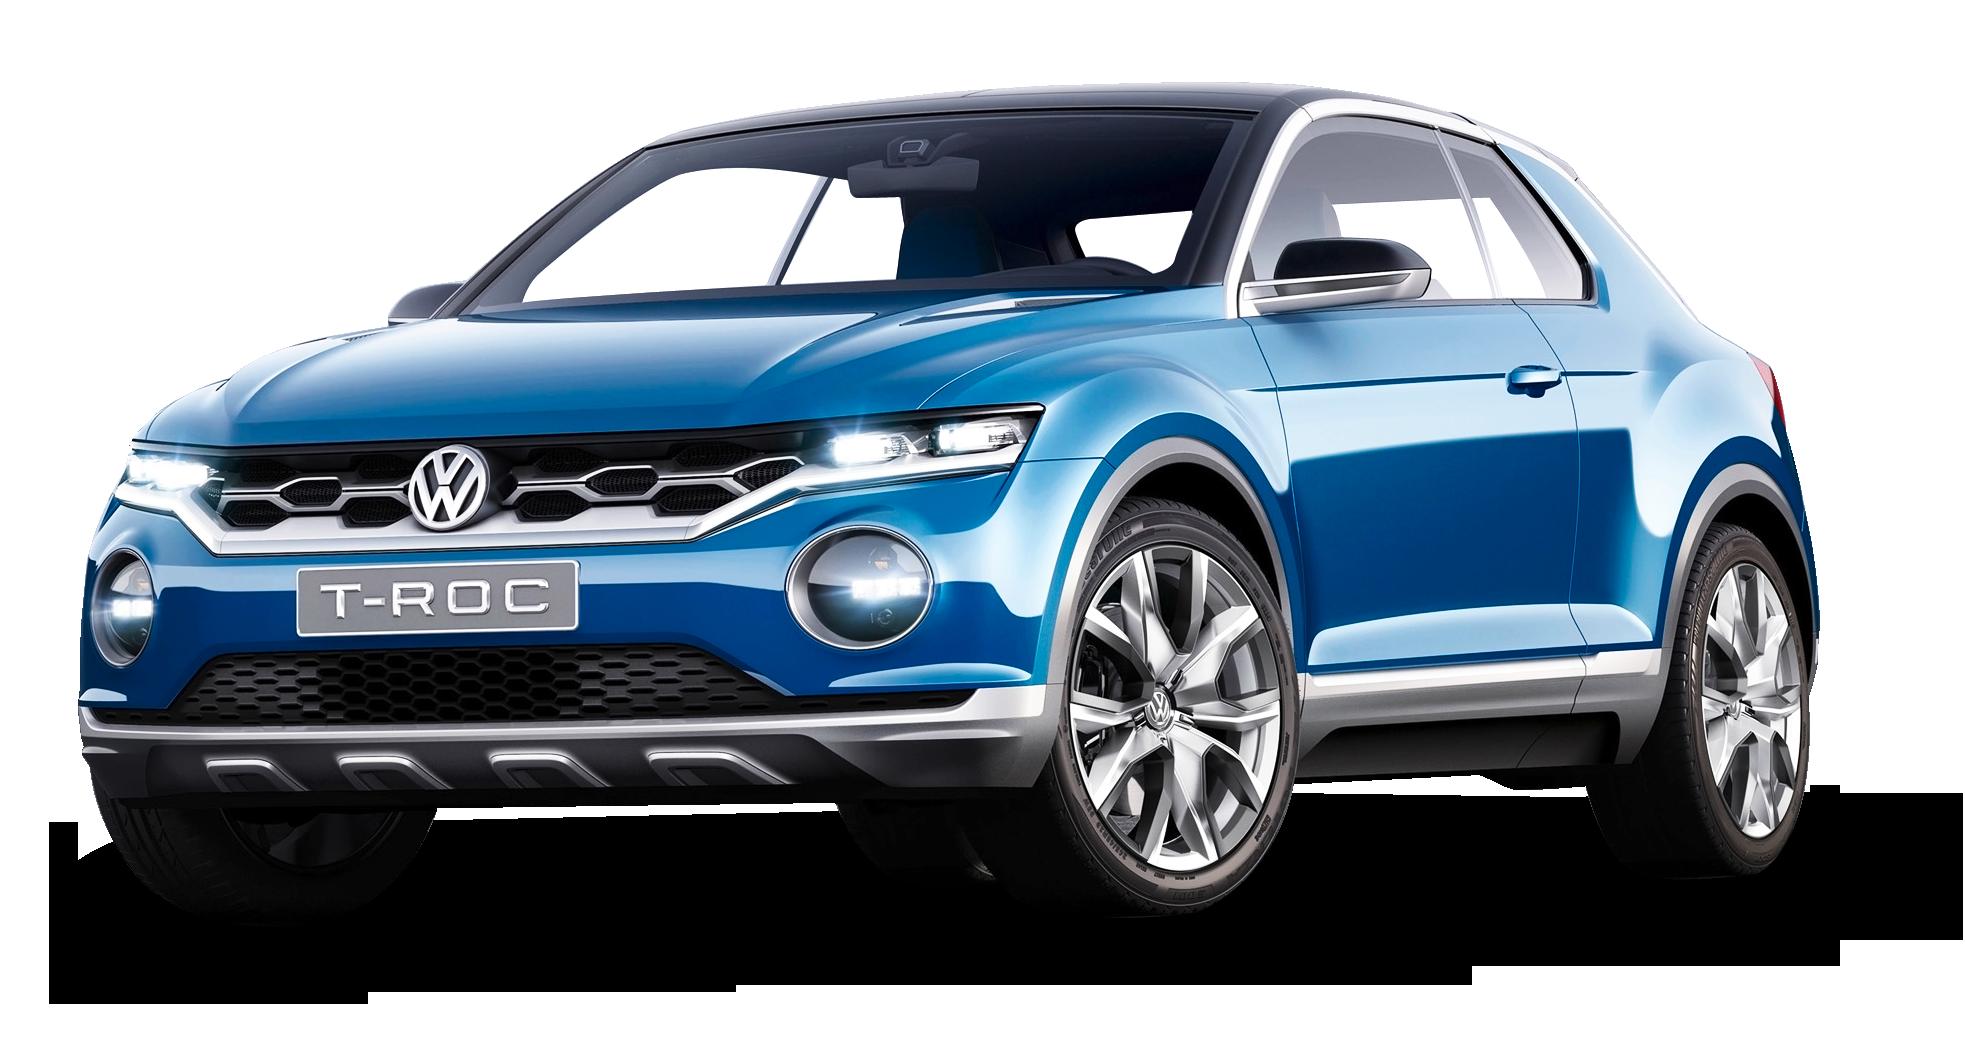 Blue Volkswagen T Roc Car PNG Image.